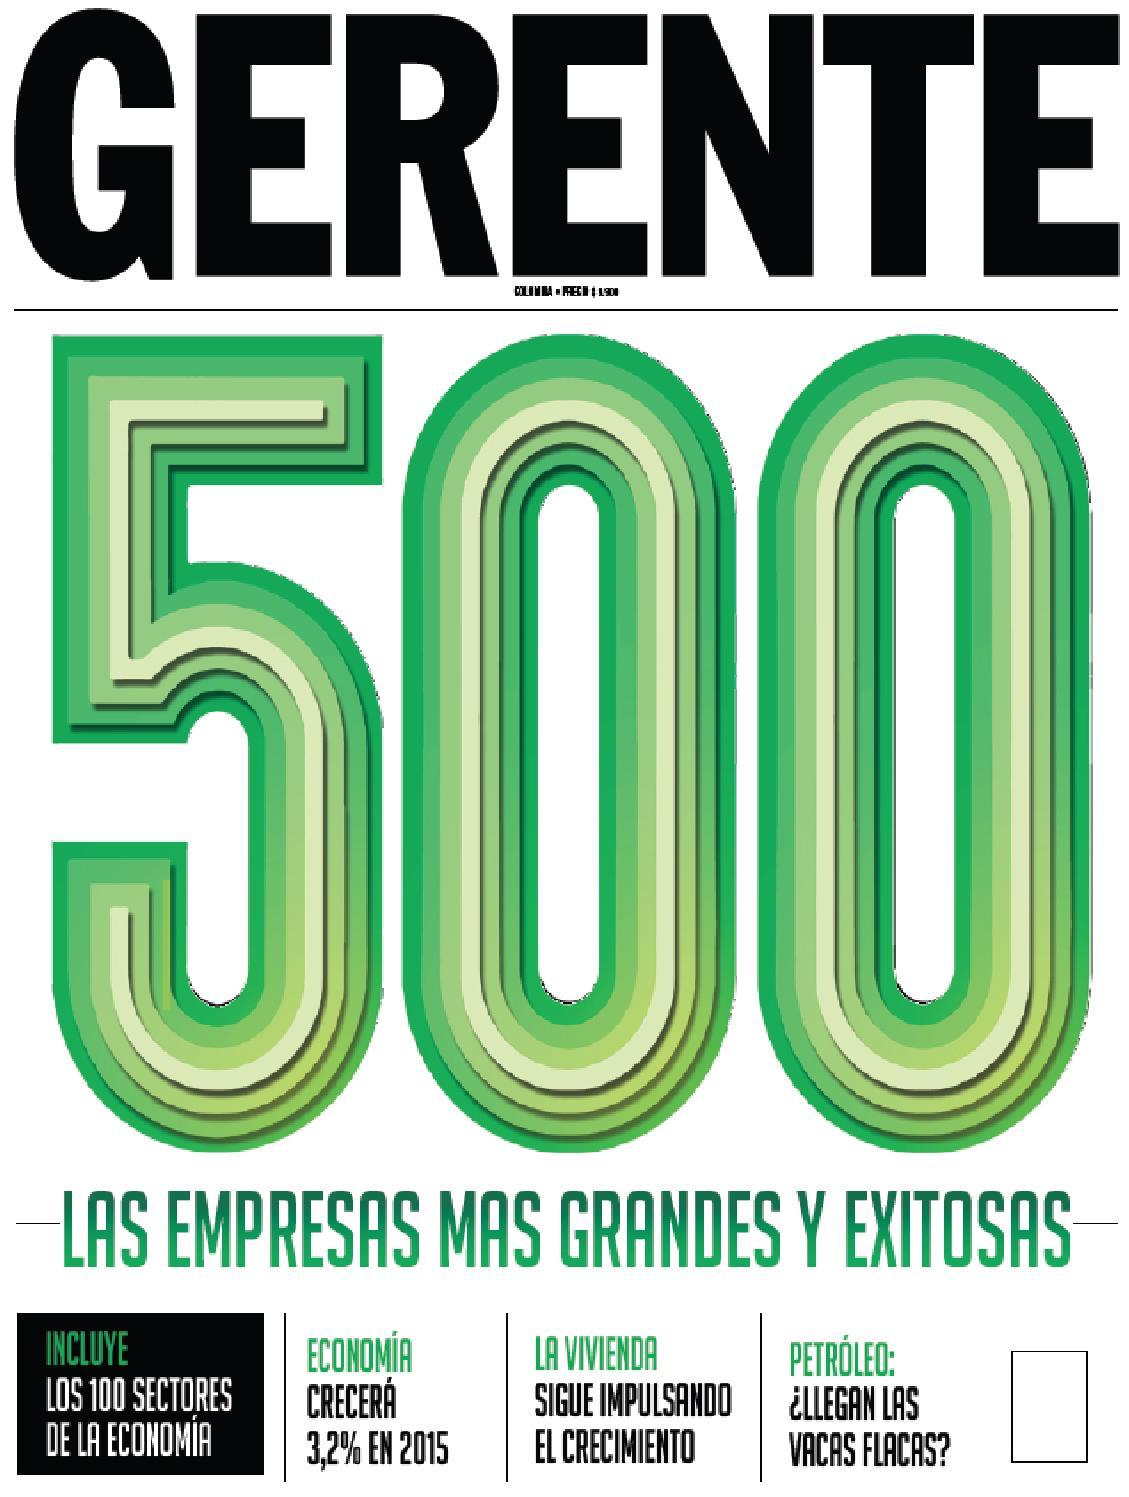 Revista Gerente Colombia 203 by REVISTA GERENTE - issuu